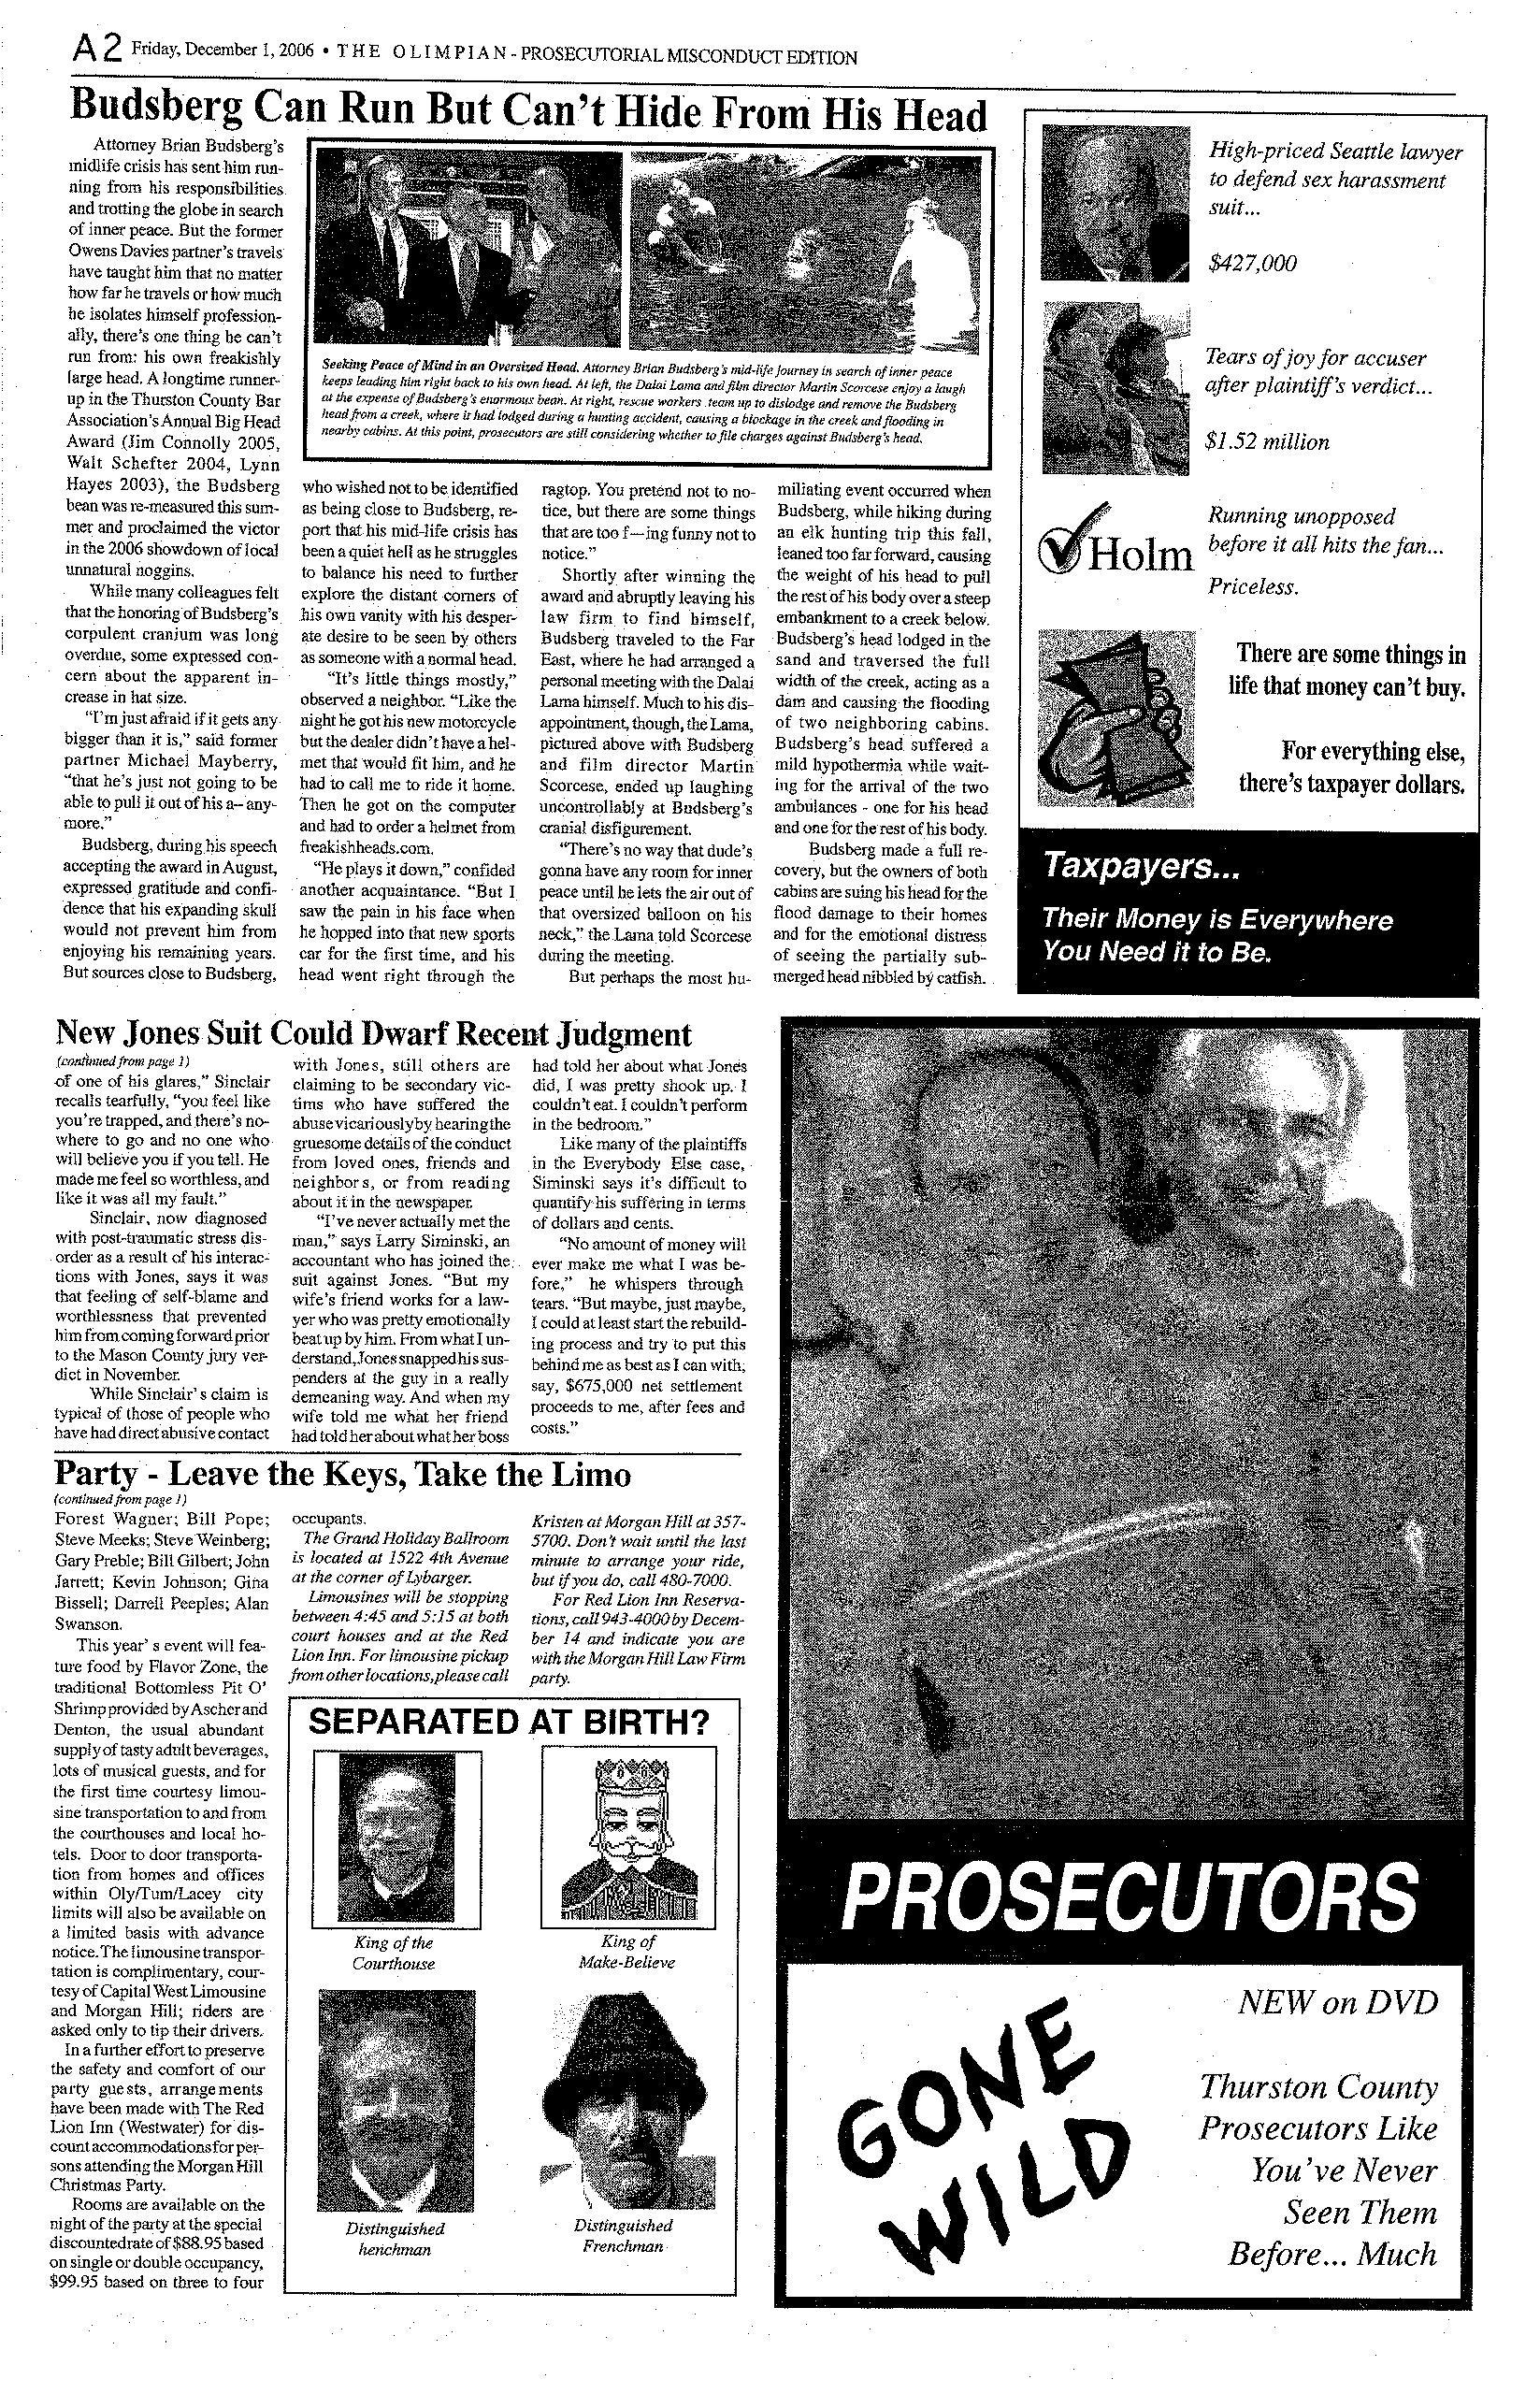 Olimpian2006-page-002.jpg